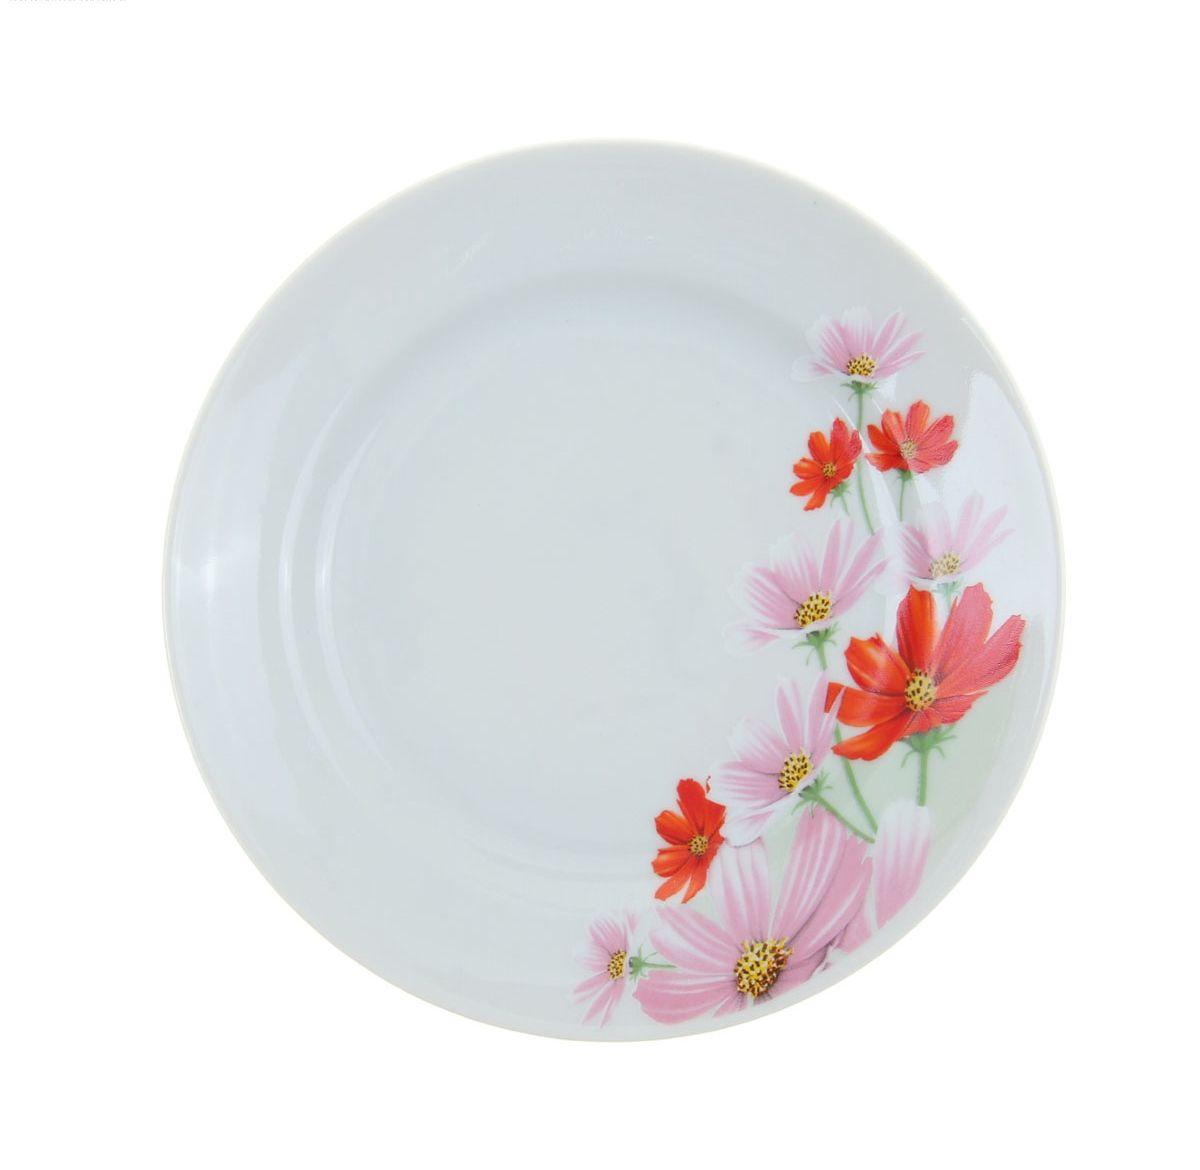 Тарелка мелкая Идиллия. Космея, диаметр 17 см тарелка идиллия космея диаметр 24 см